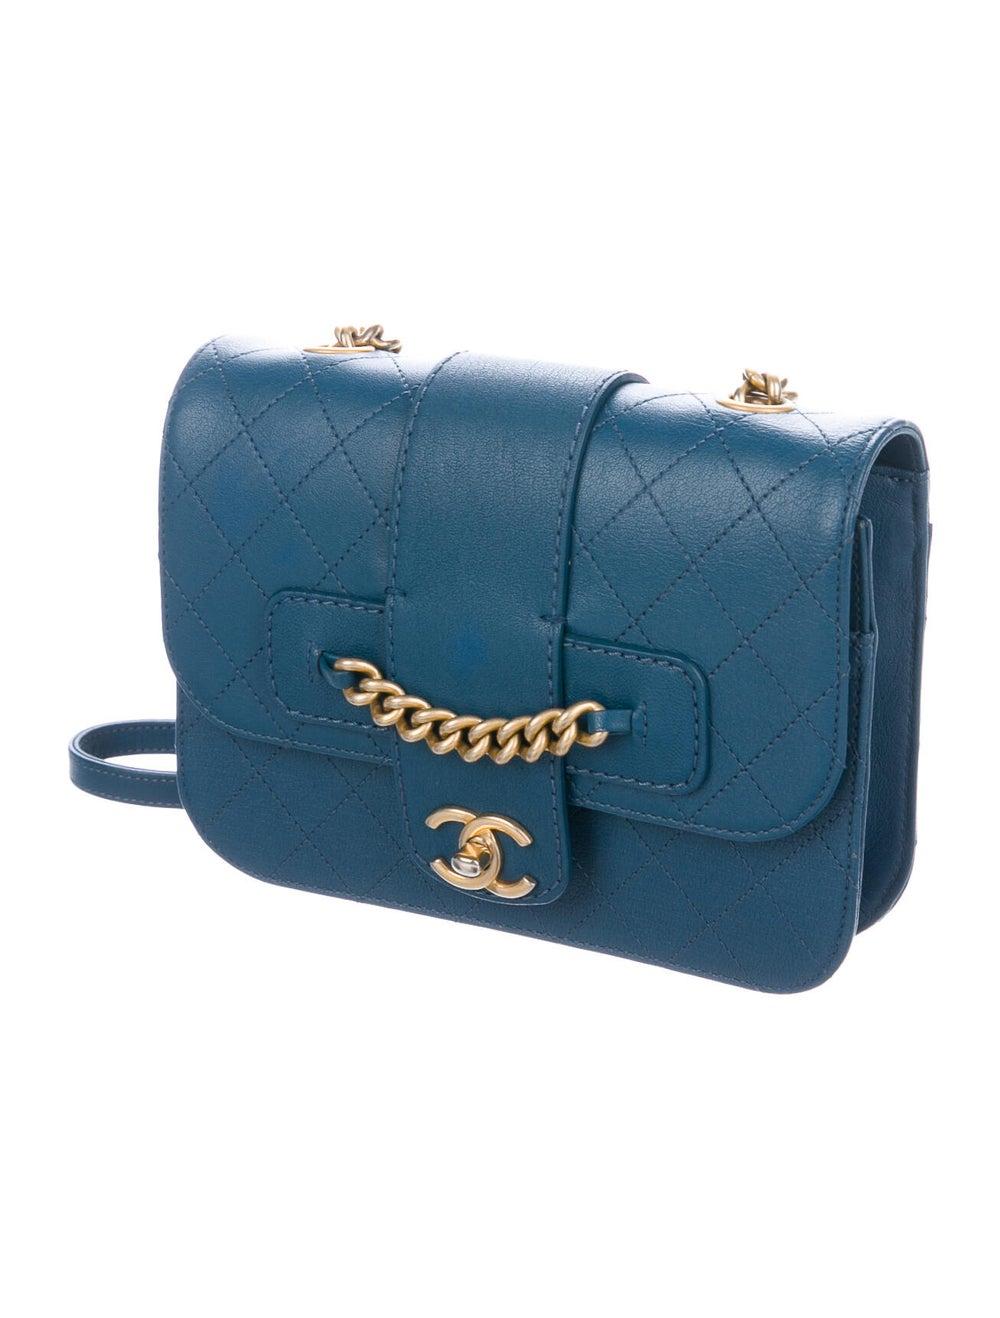 Chanel Front Chain Flap Bag Blue - image 3